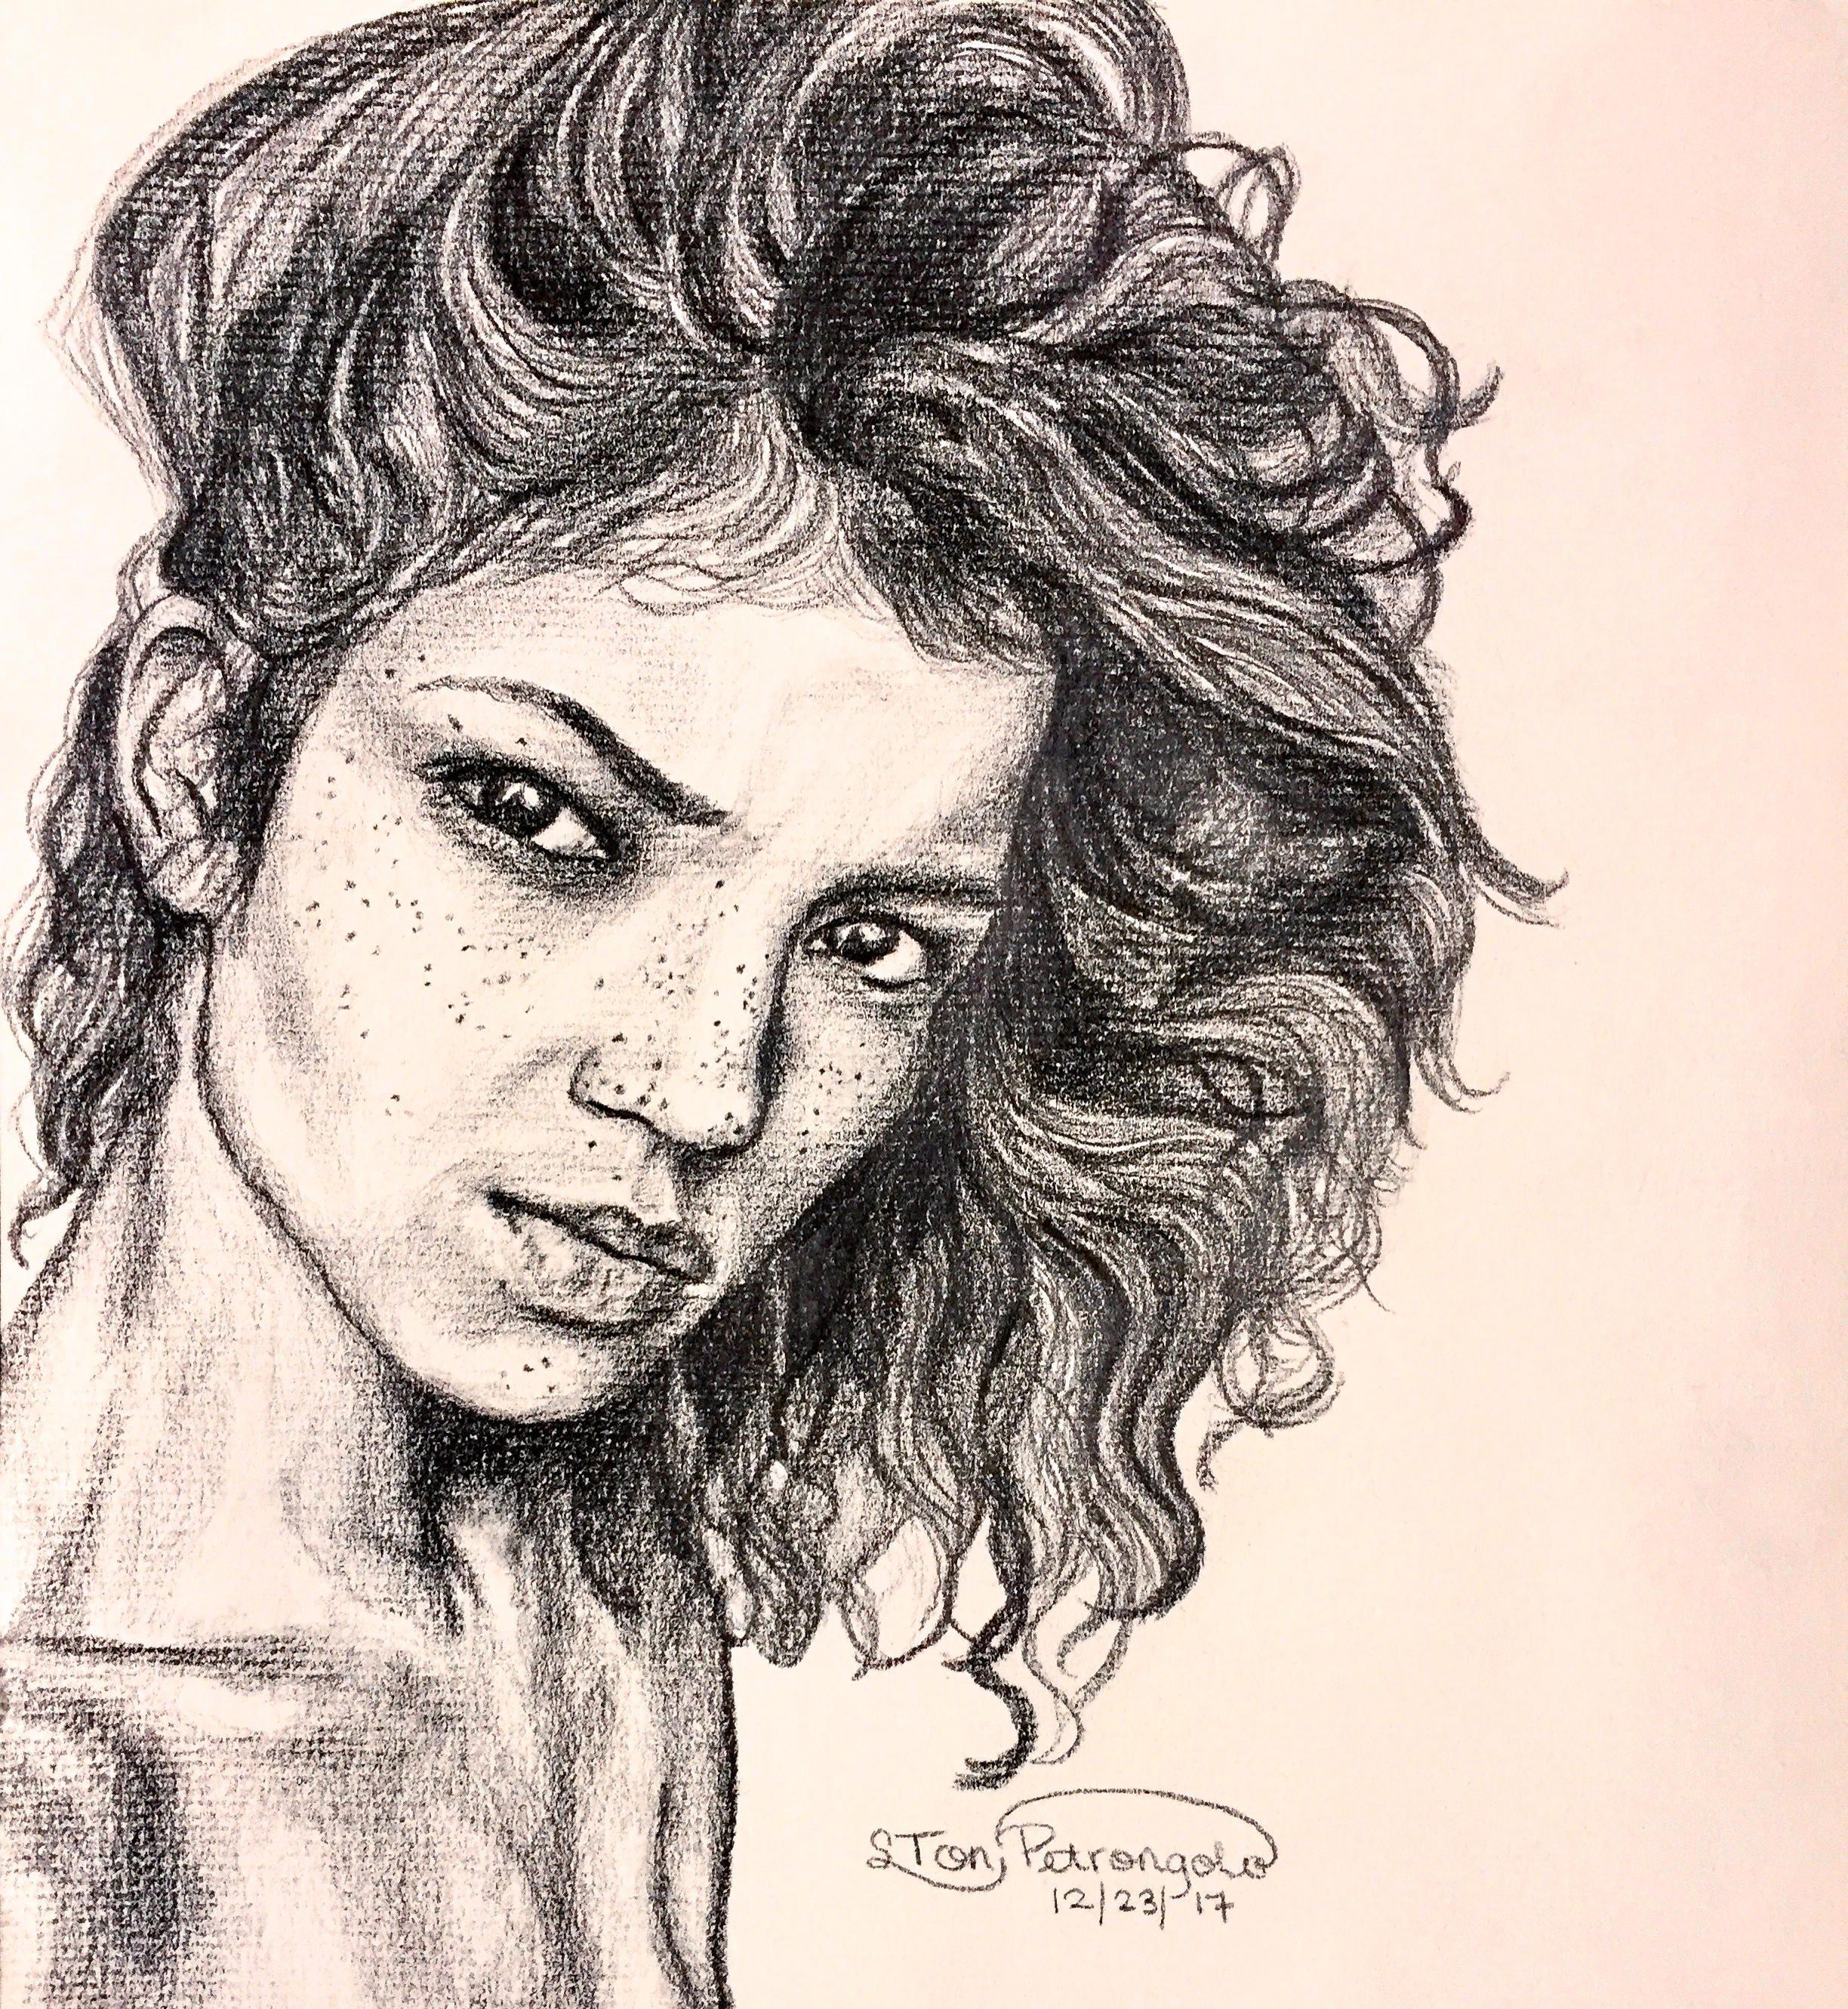 Female portrait pencil drawing dramatic artwork realistic art pencil sketch freckles portrait art figurative art original art